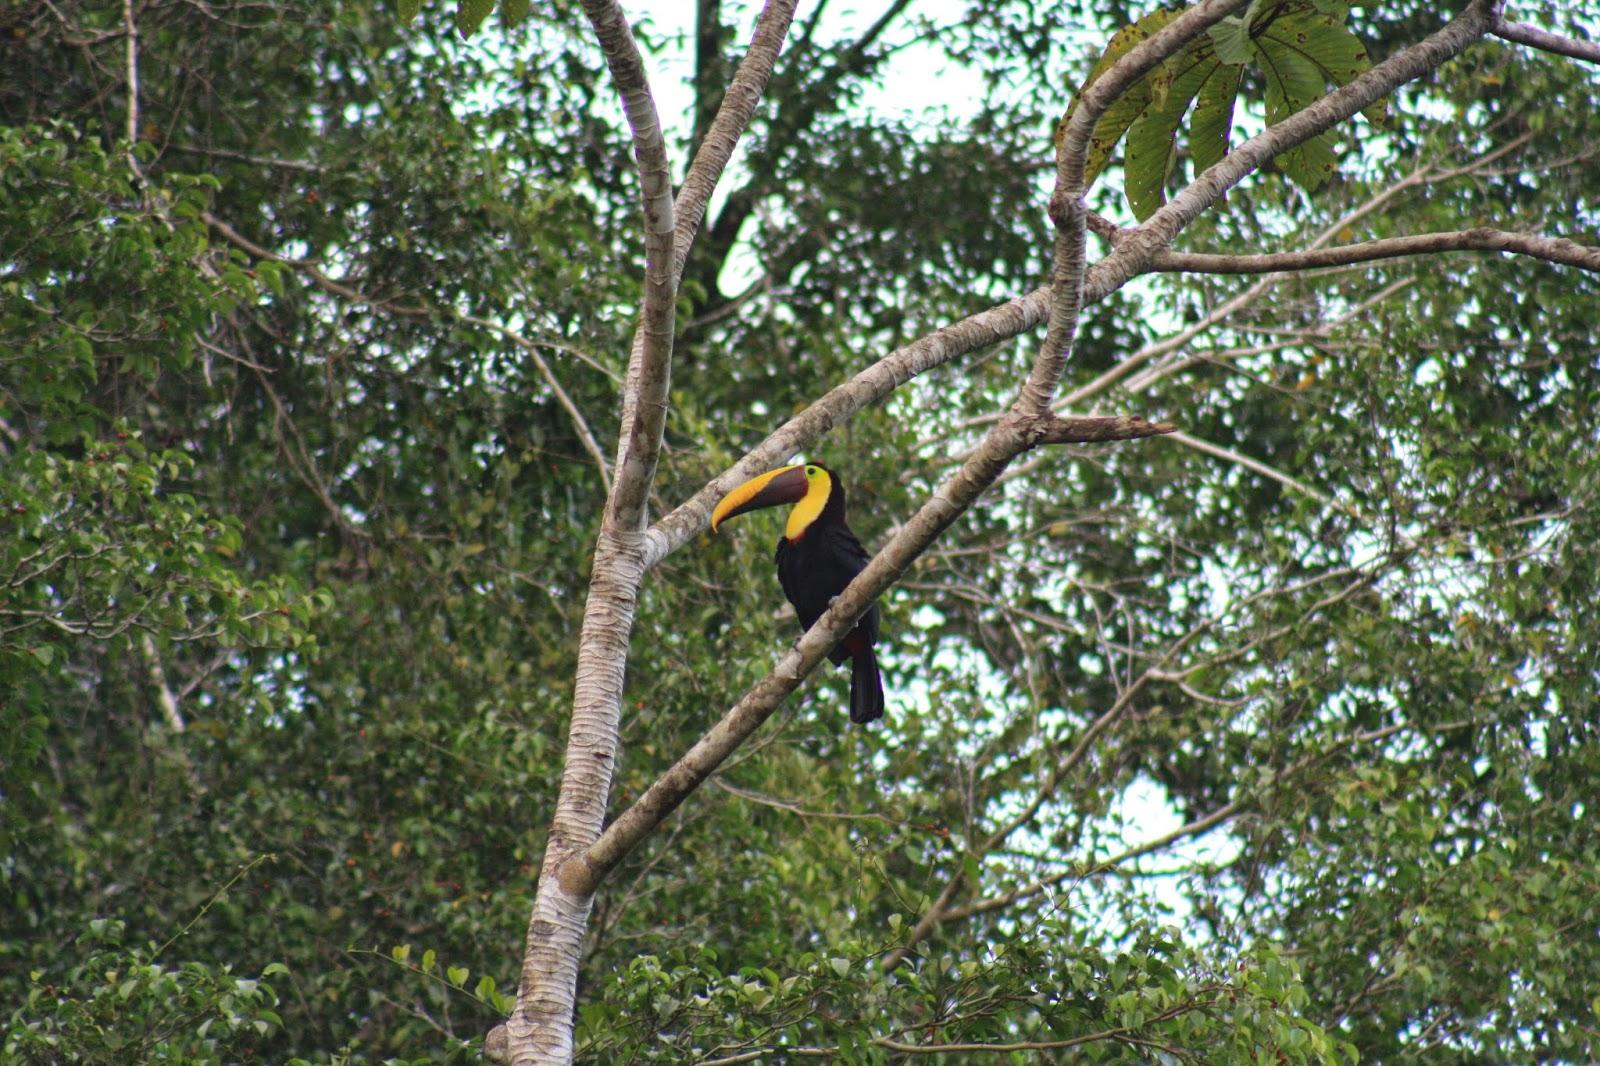 Costa Rica: Bring your camera